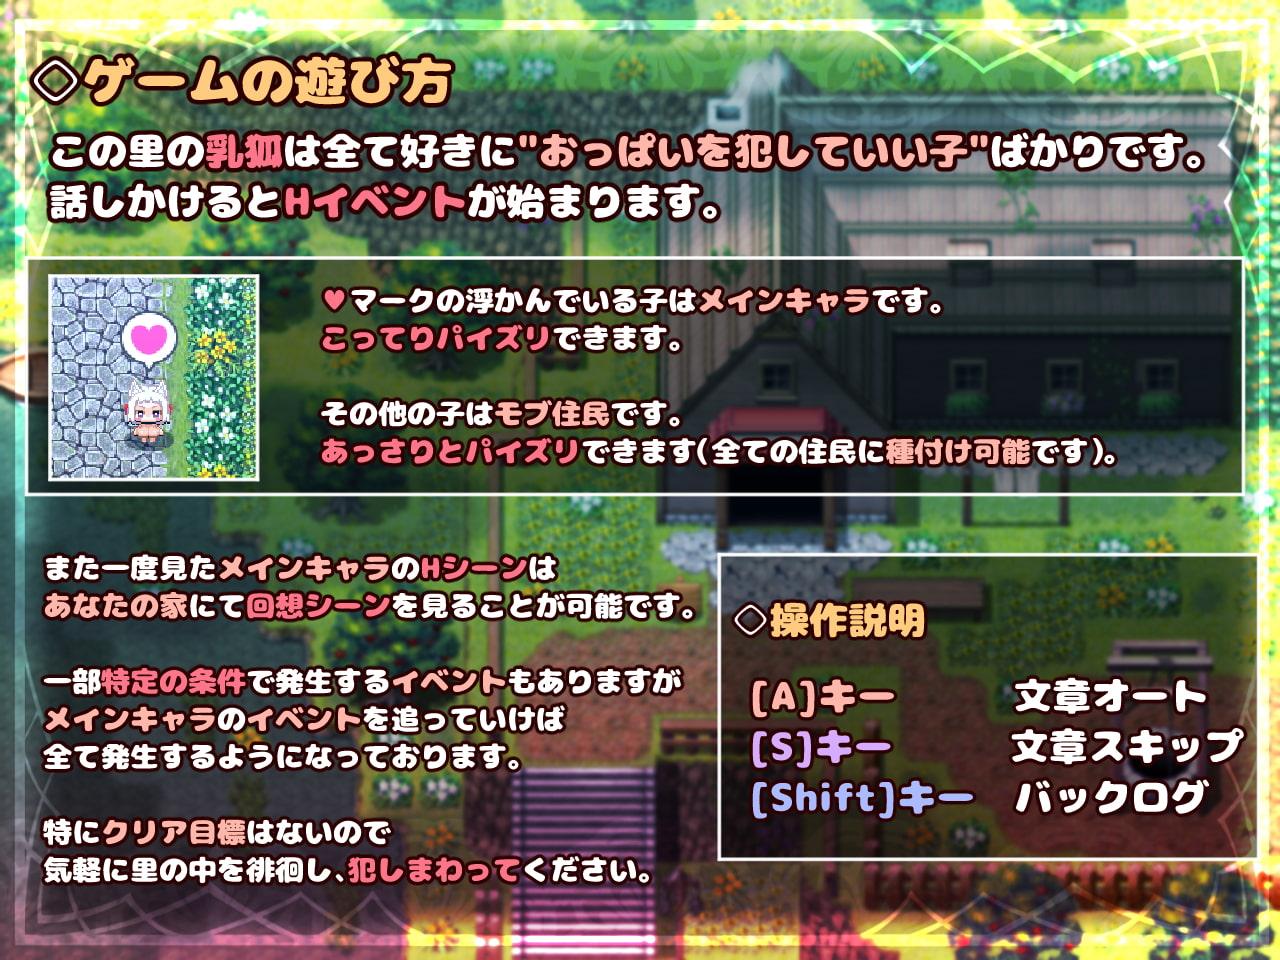 RJ318770 けもちち~ロリ爆乳種付交尾録~(ゲーム版) [20210307]